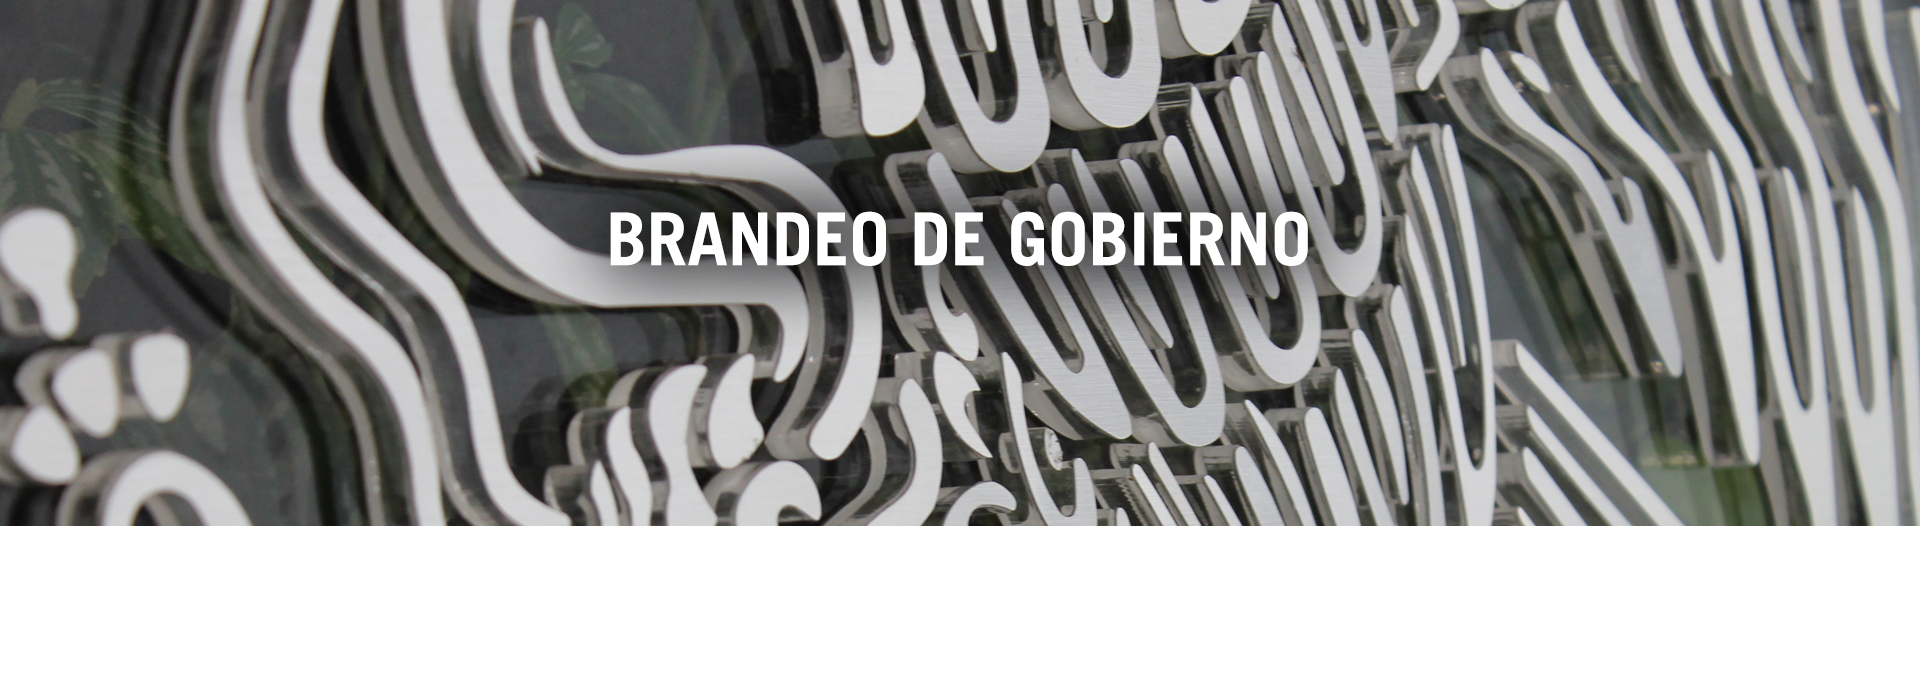 logos gobierno